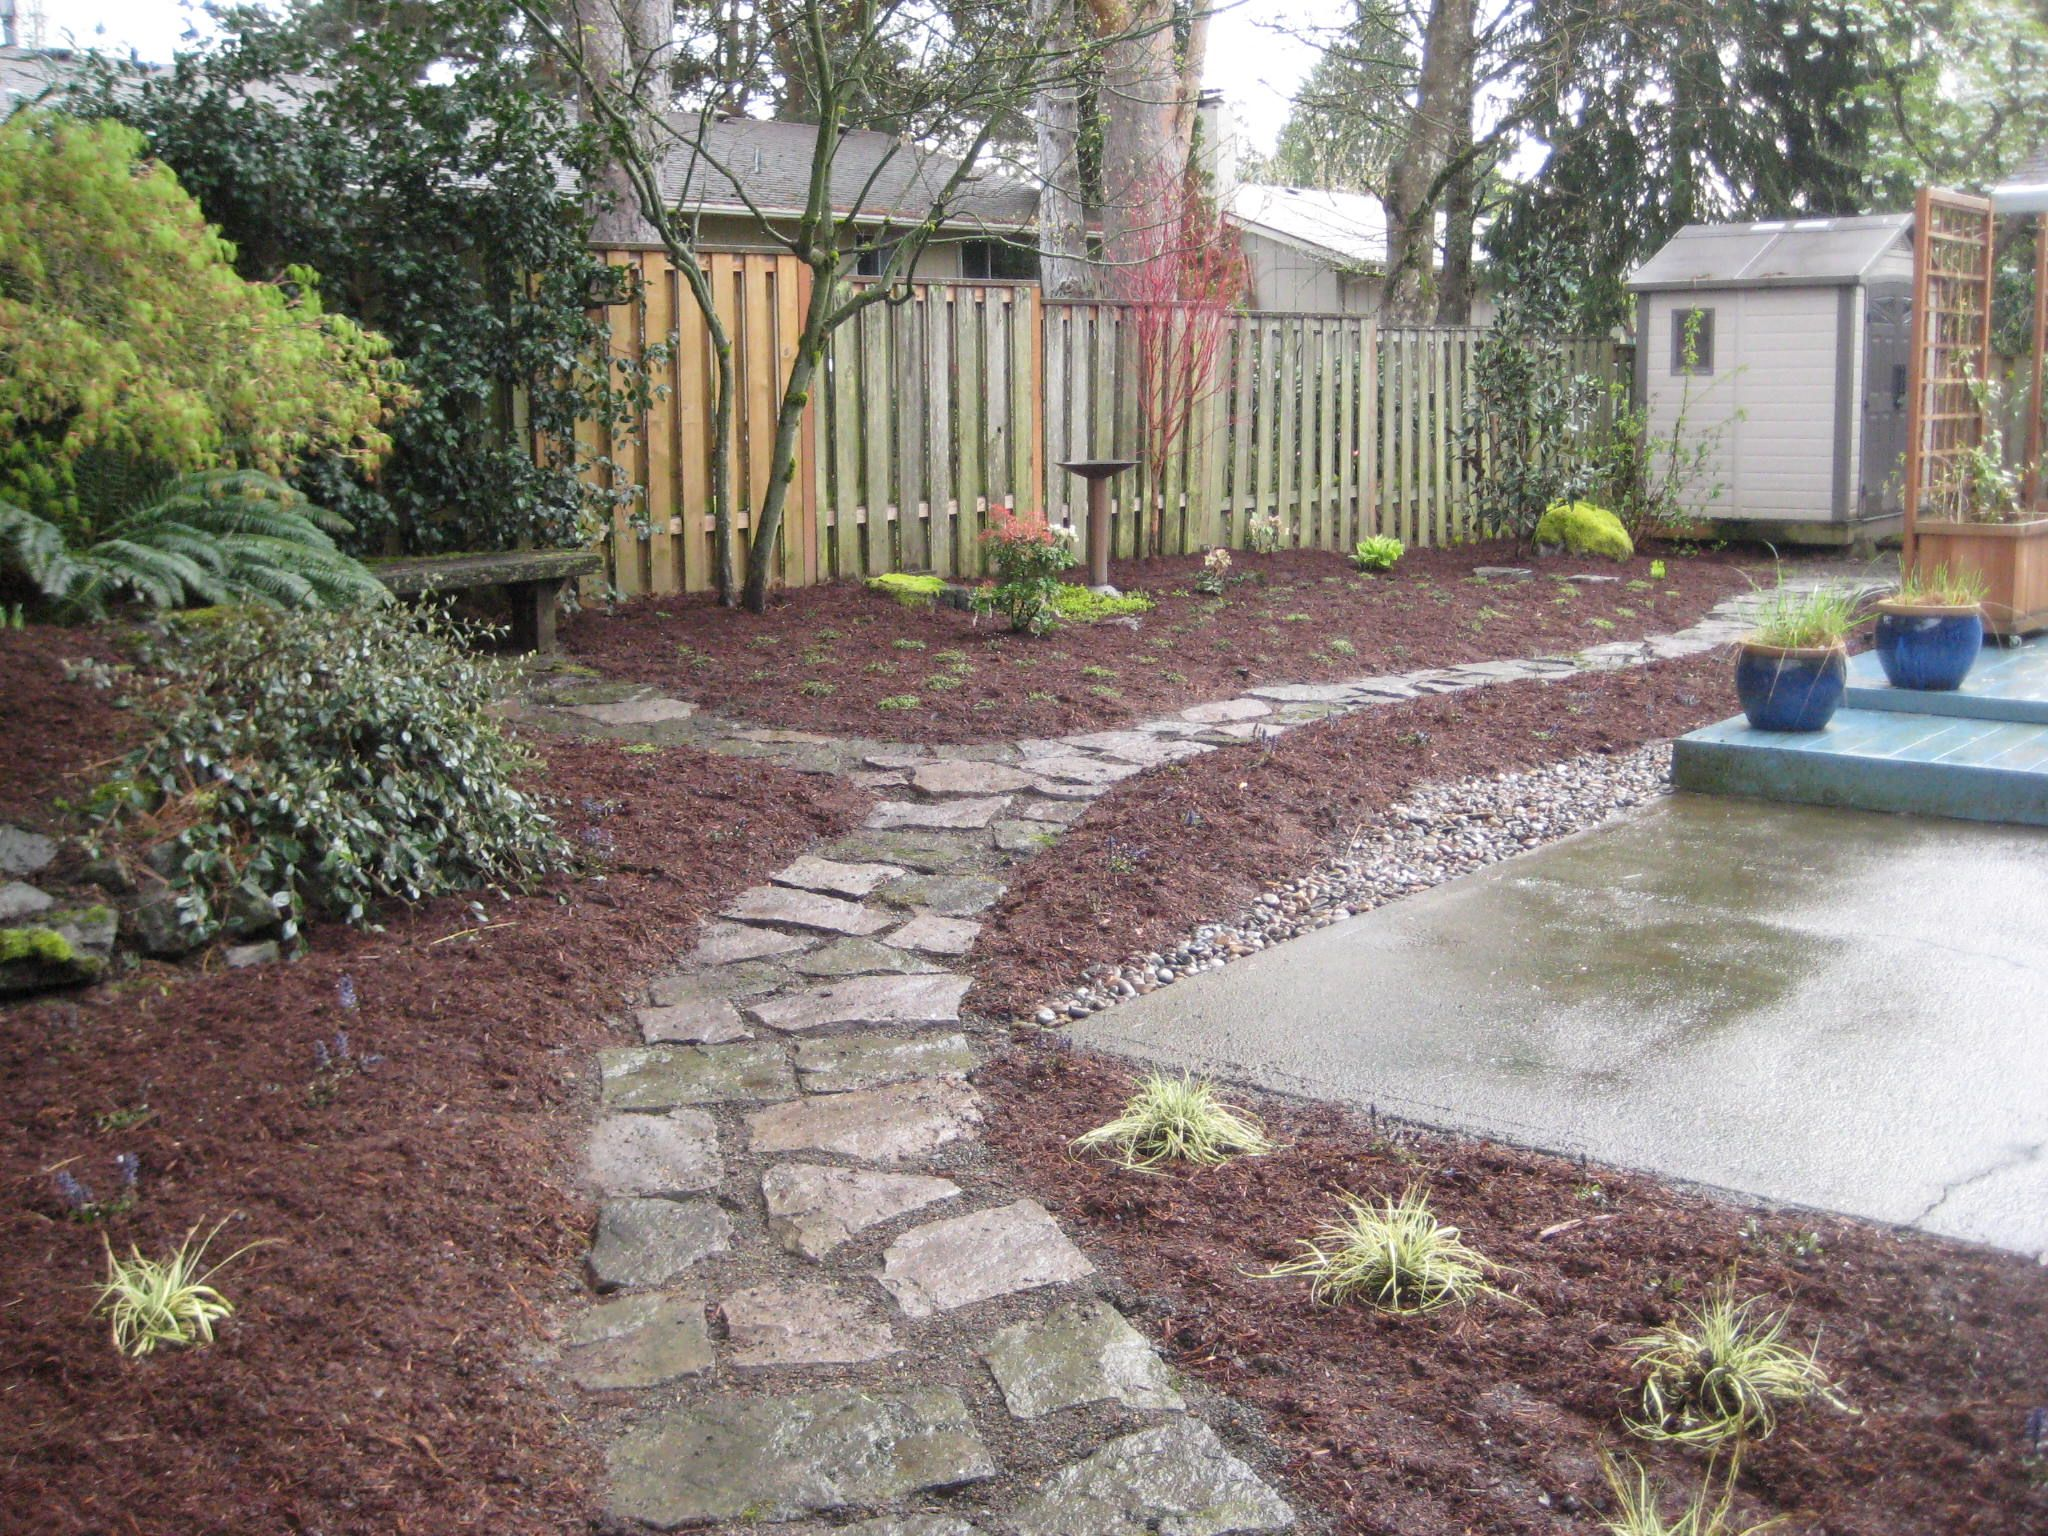 Backyard Ideas Without Grass For Dogs Thorplc Com No Grass Backyard Small Backyard Landscaping Backyard Garden